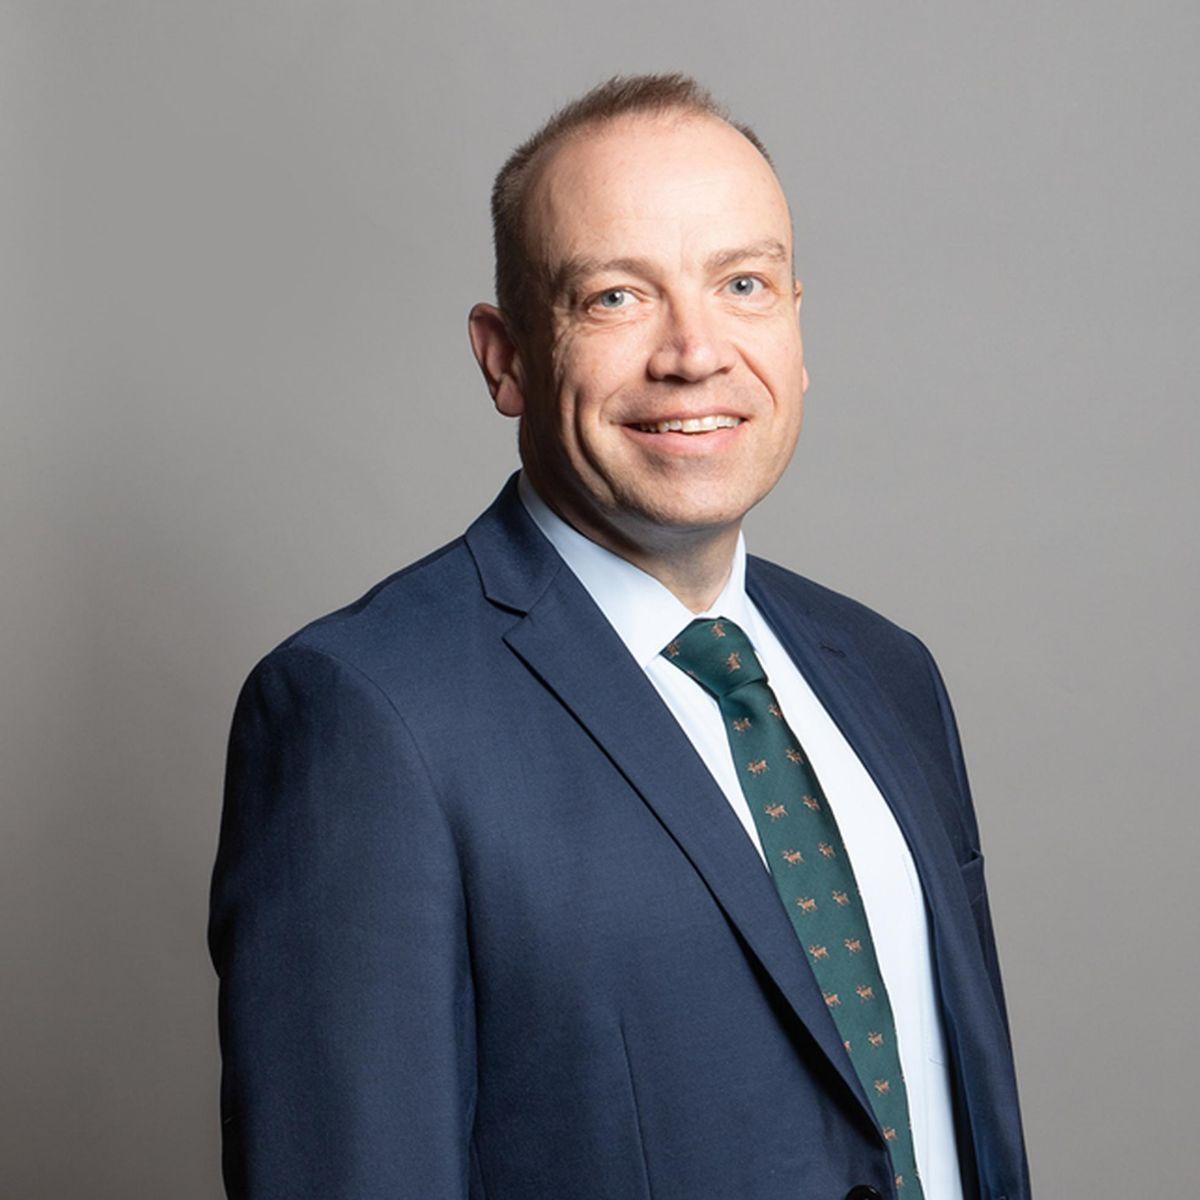 Transport Minister Chris Heaton-Harris